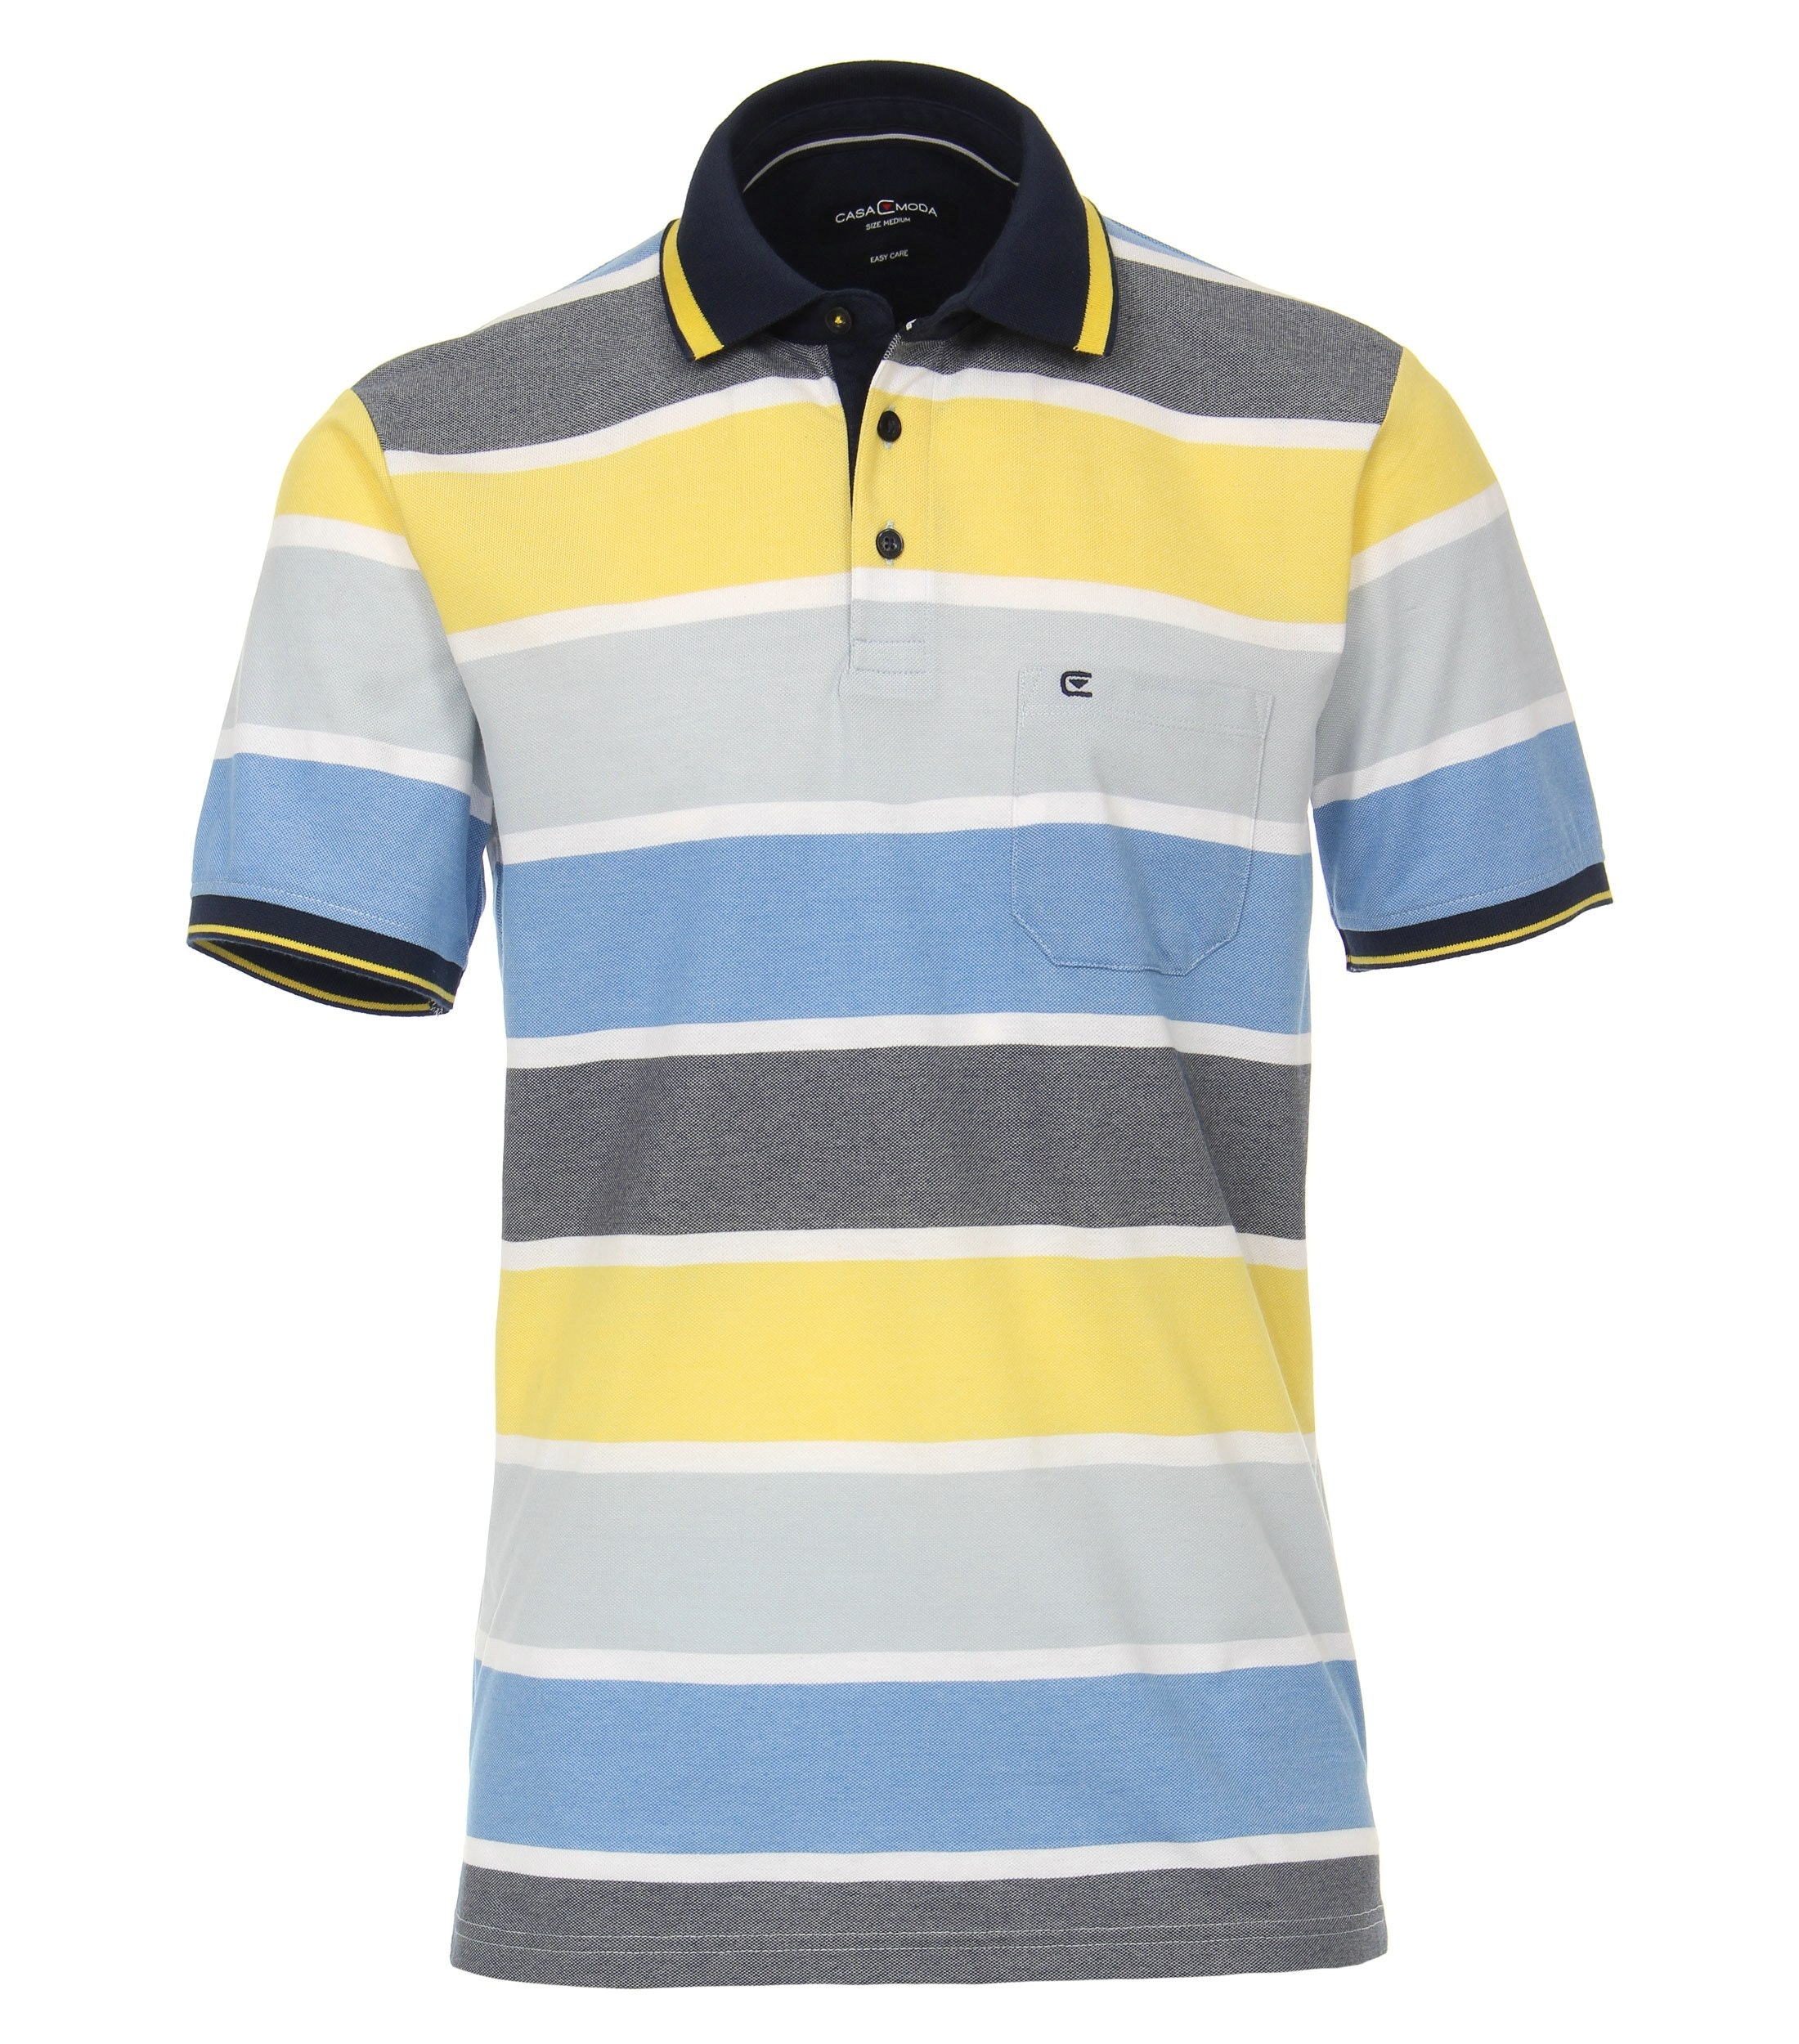 CasaModa kurzarm Poloshirt gelb gestreift